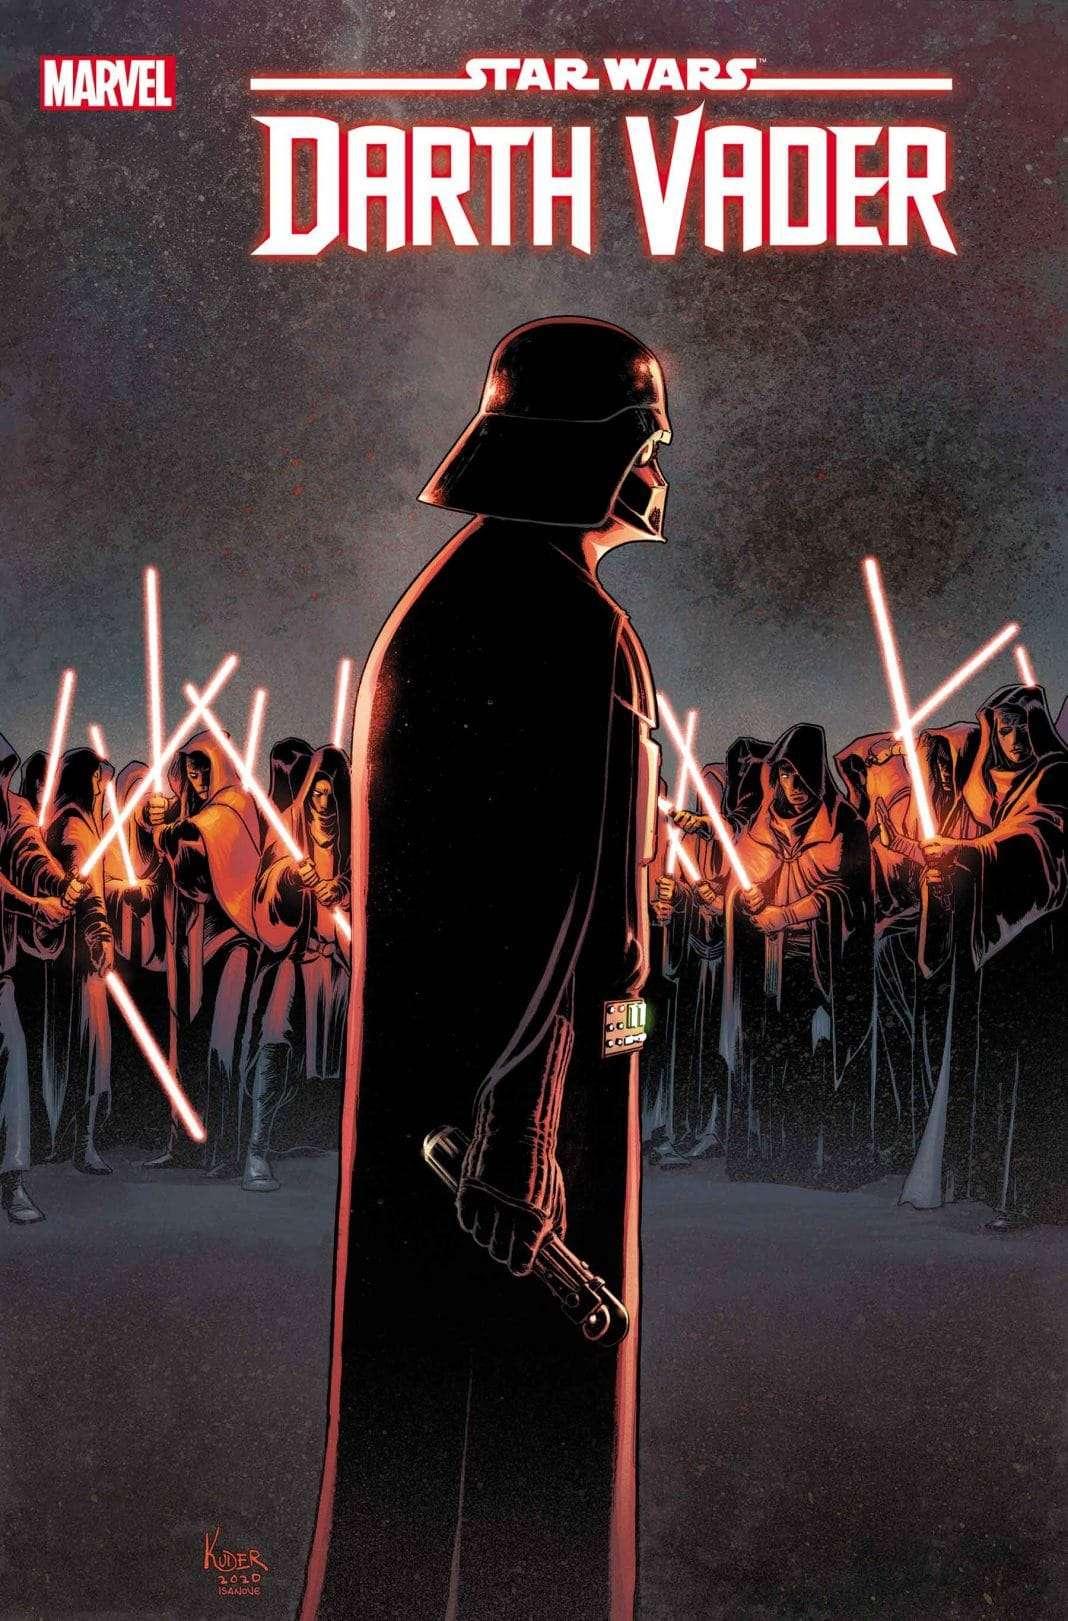 darth vader anteprima aprile, Di nuovo su Exegol. Anteprima di Darth Vader (2020) #11, Star Wars Addicted